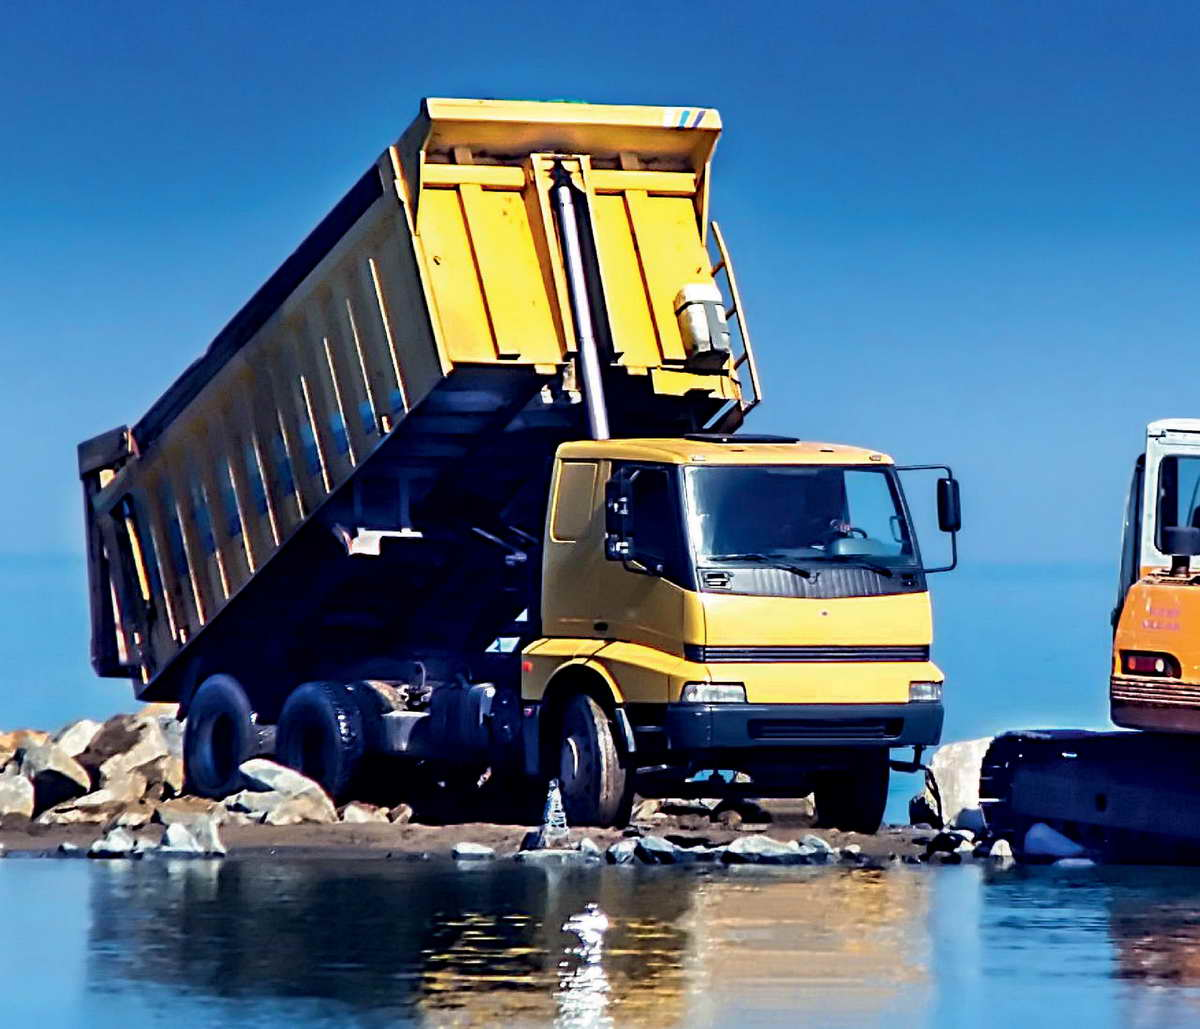 triangle_g2-offroad-truck_1000x1600_2015-08-07_v05_sj.indd